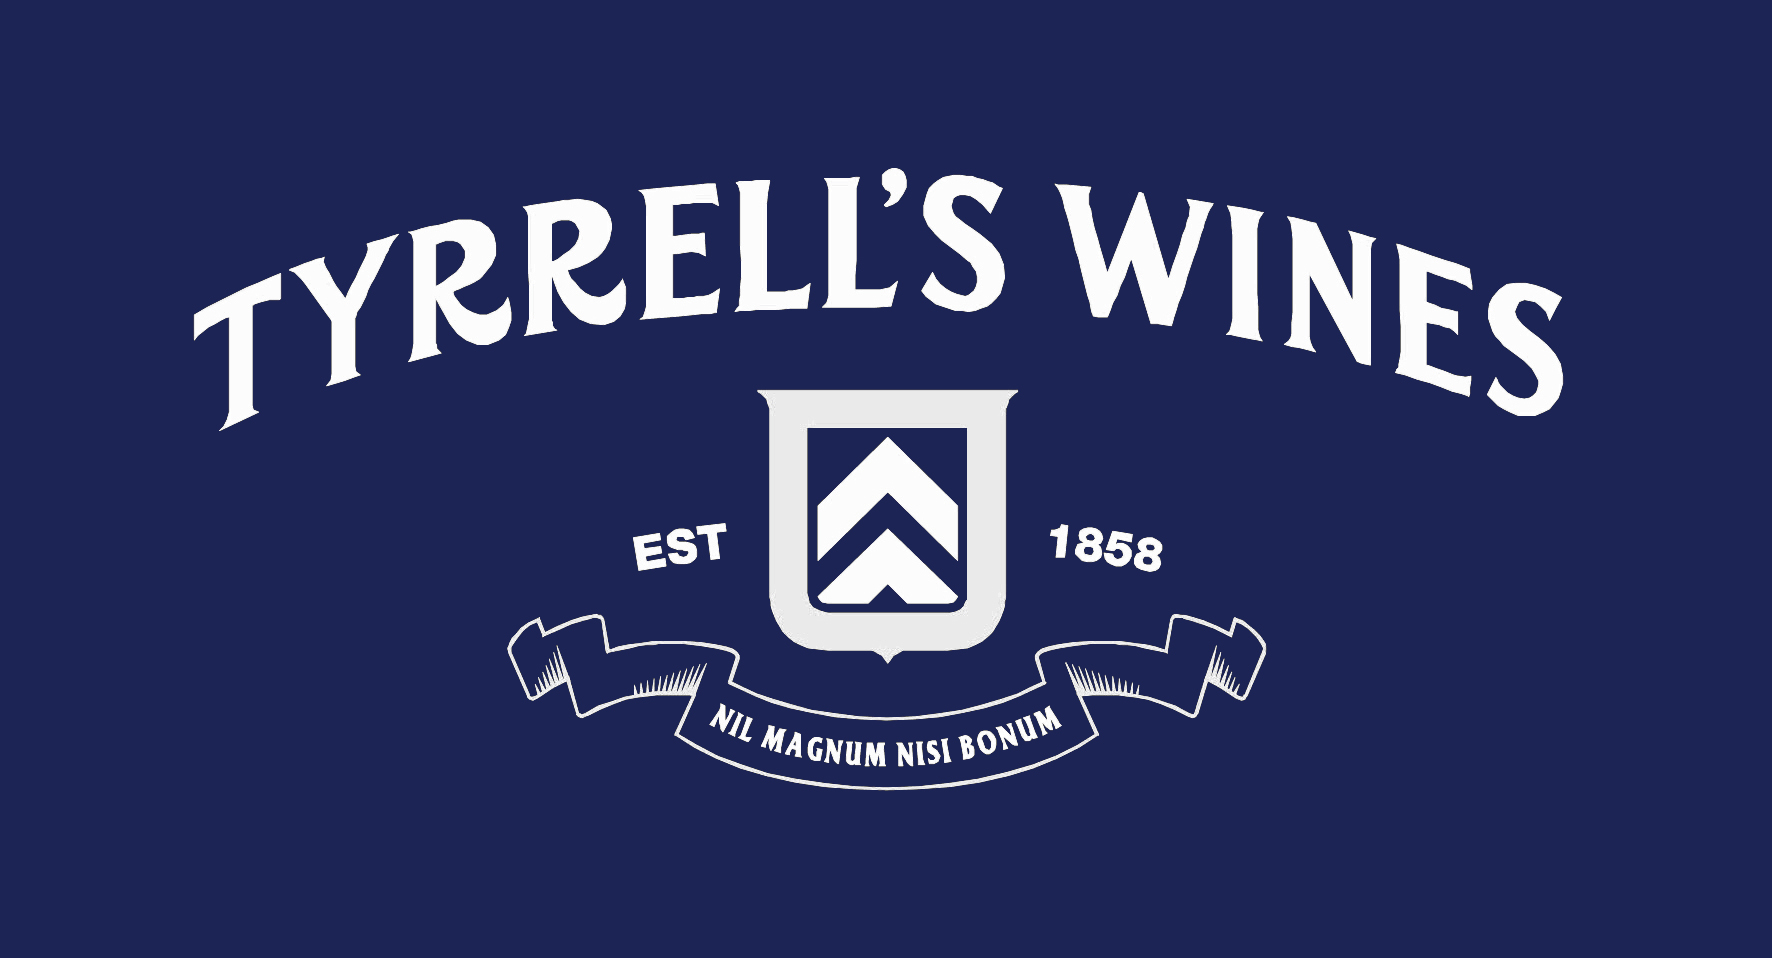 Tyrrells_AW.jpg